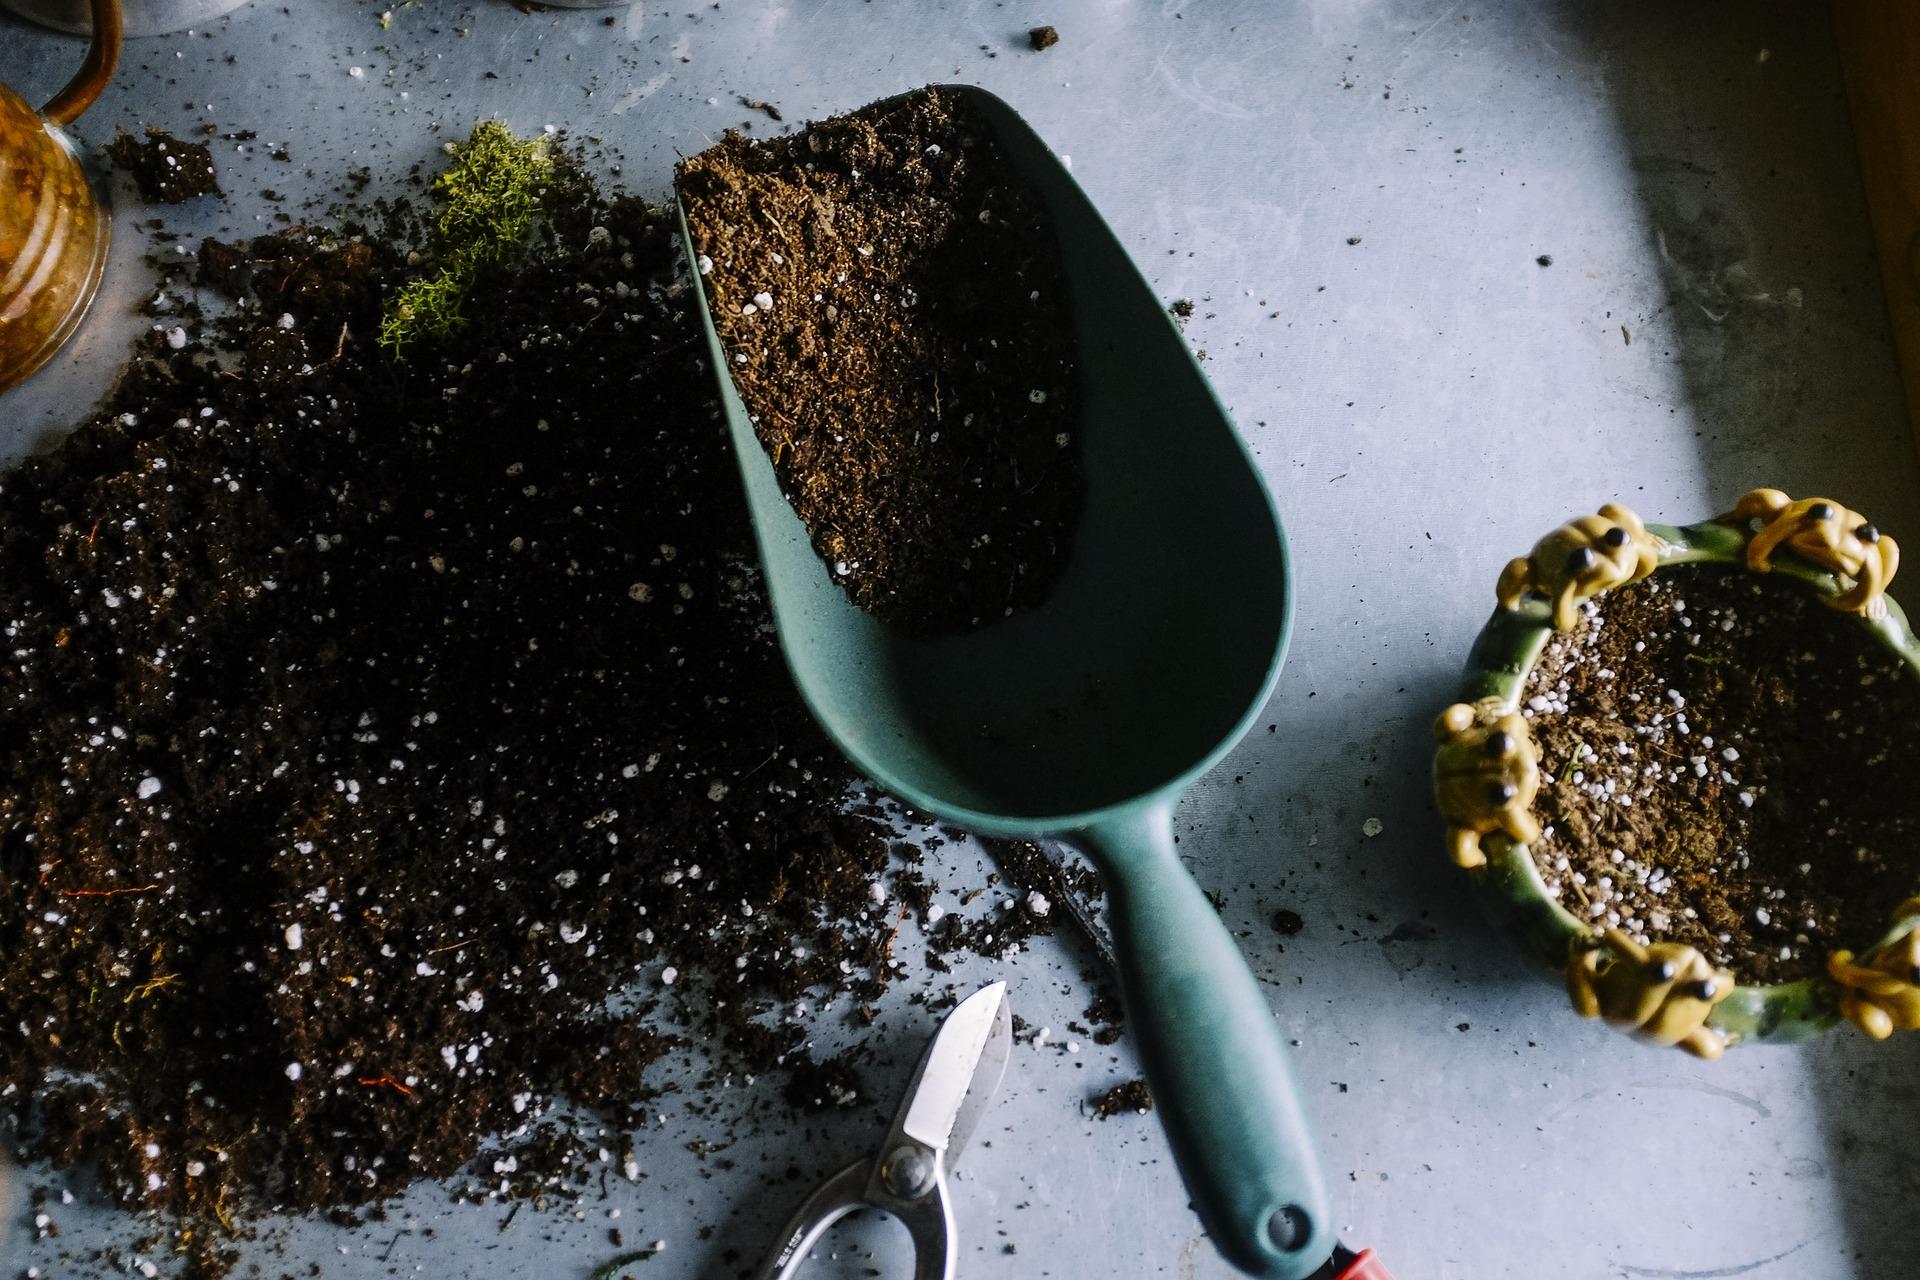 , What Makes A Good Garden Soil?, Best Garden, Home And DIY Tips